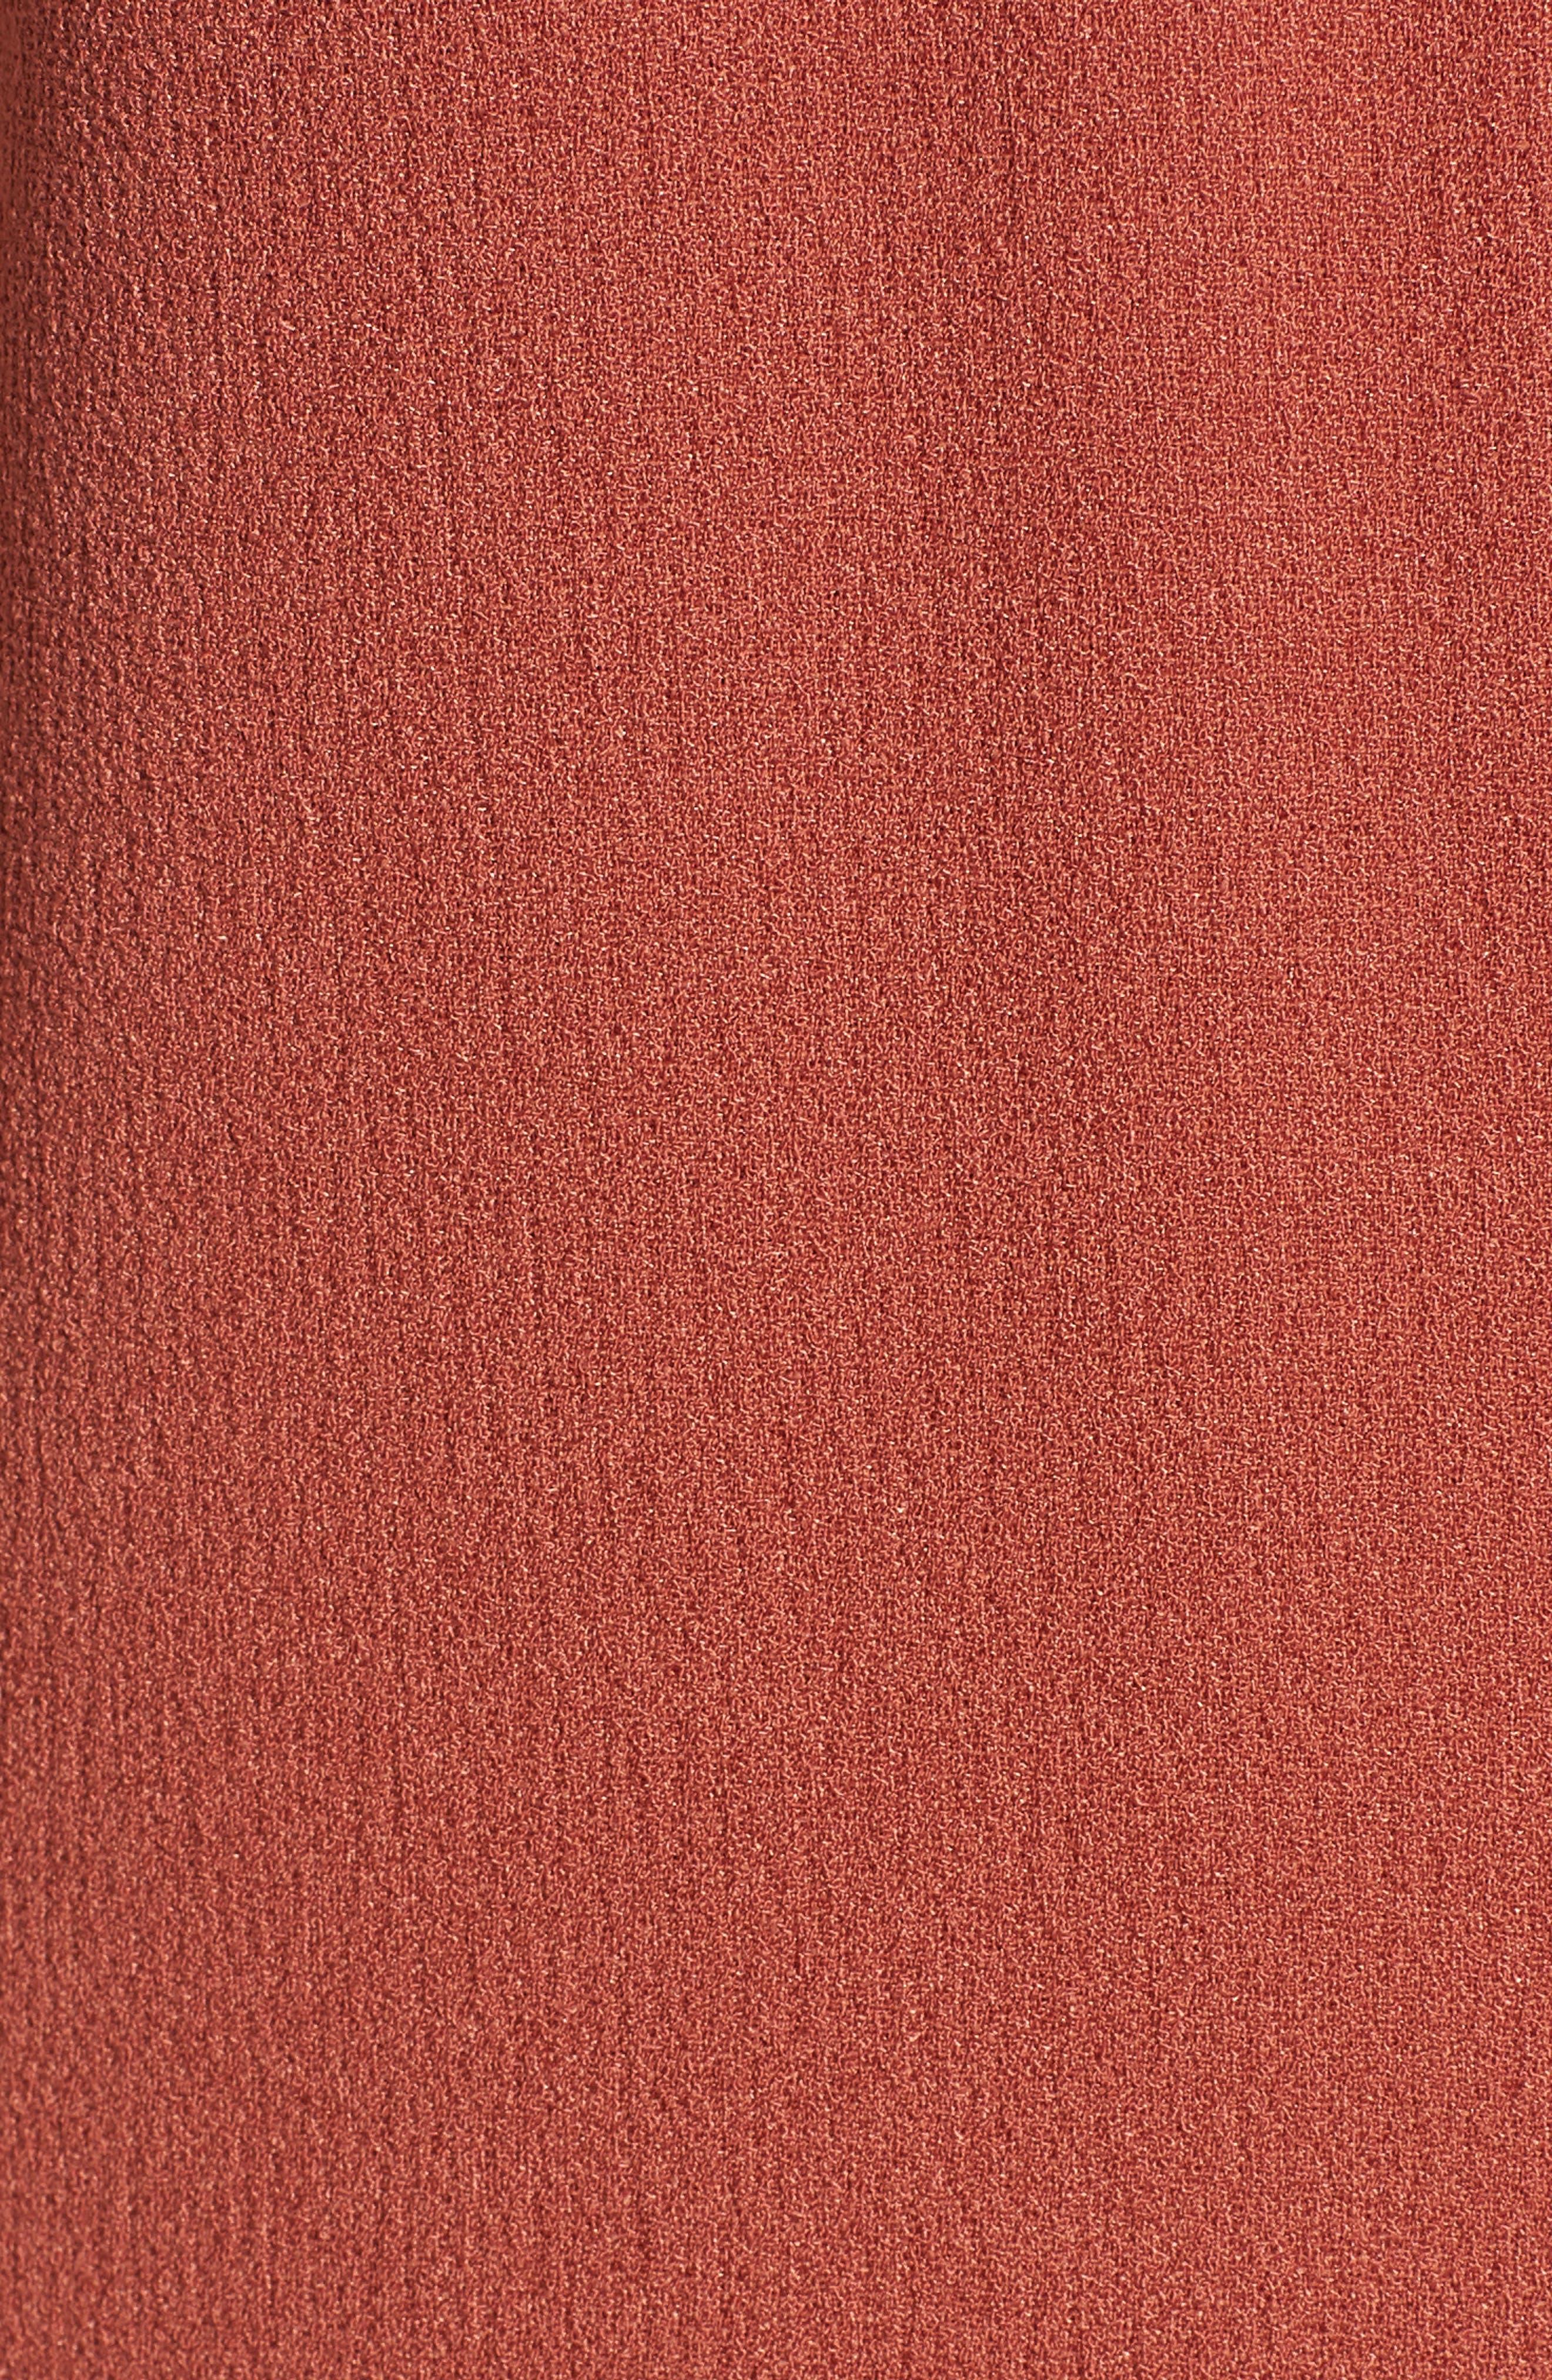 Hailey Crepe Dress,                             Alternate thumbnail 138, color,